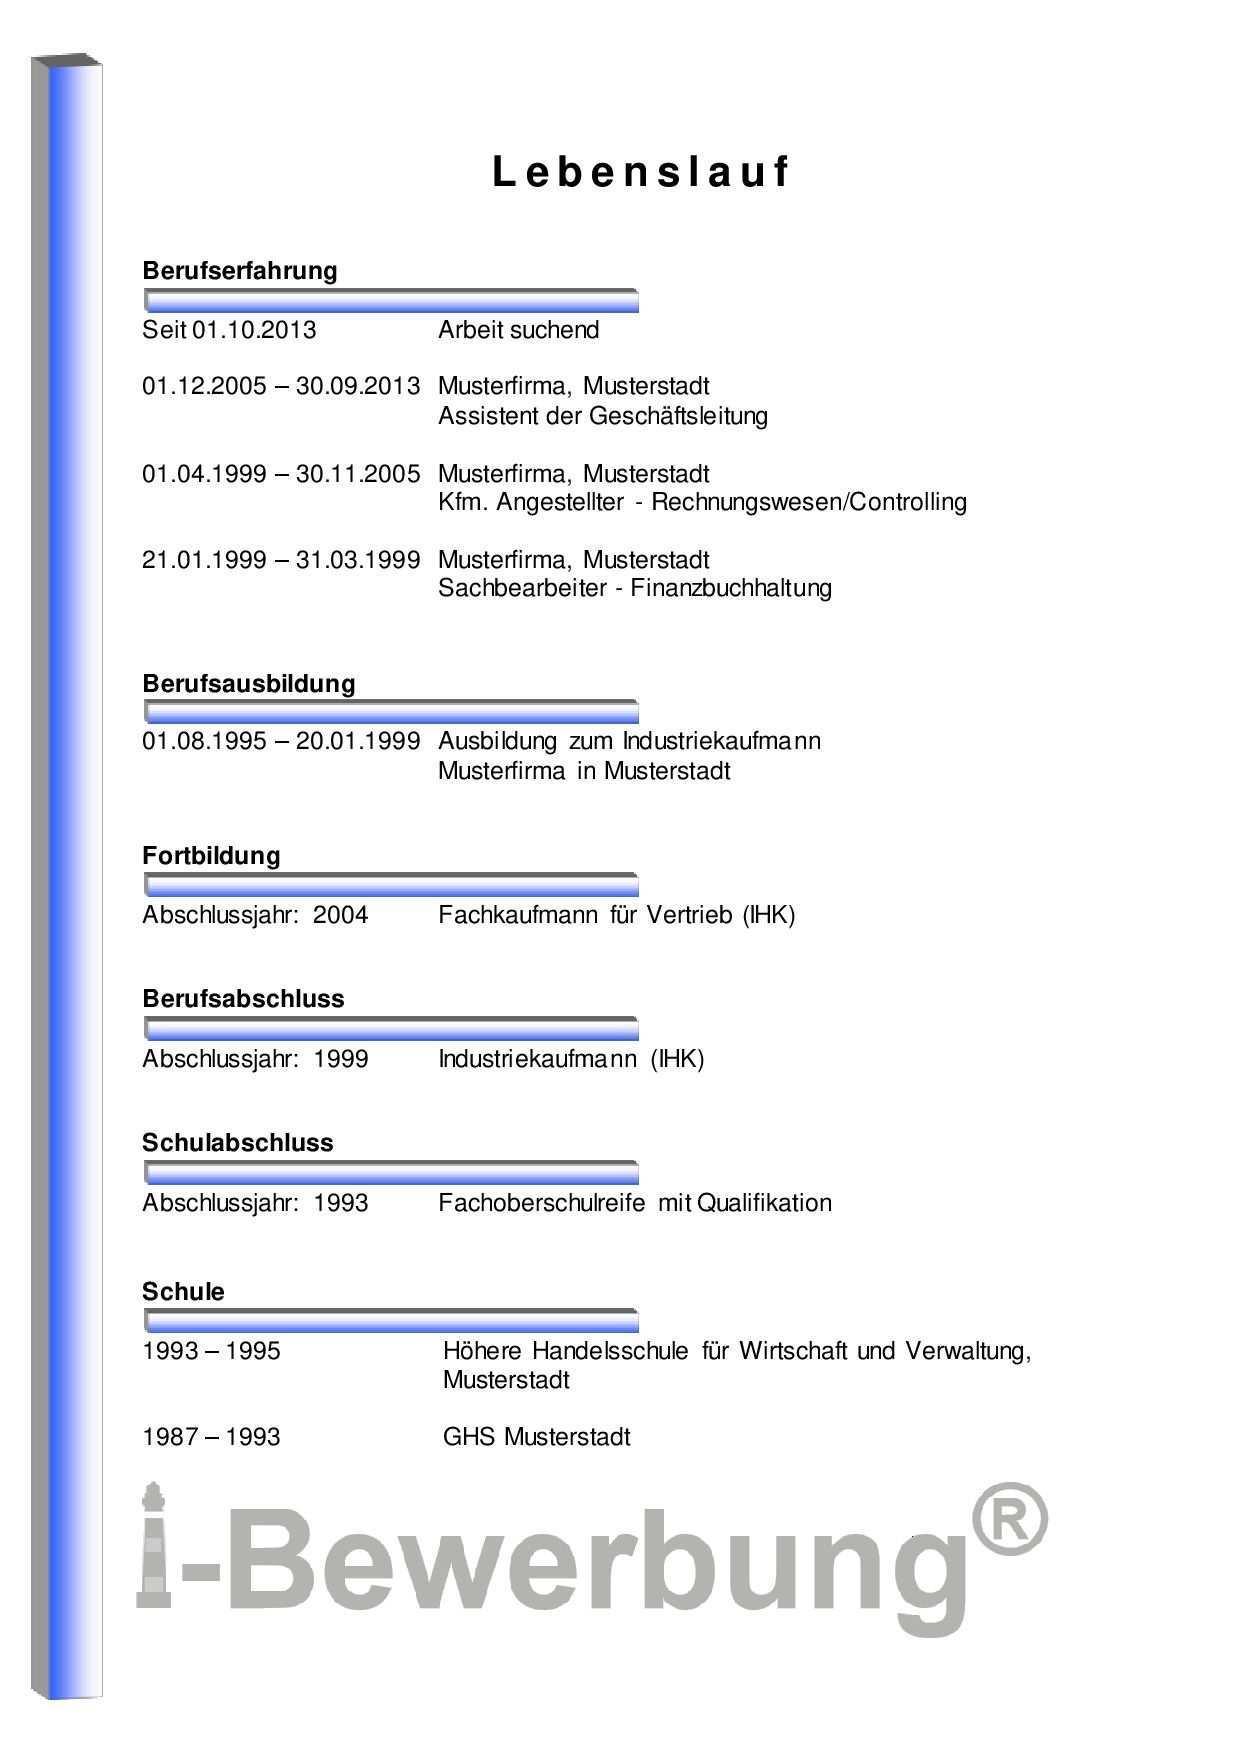 Initiativbewerbung Fur Den Assistenzbereich Muster Lebenslauf Vorlagen Lebenslauf Lebenslauf Lebenslauf Tipps